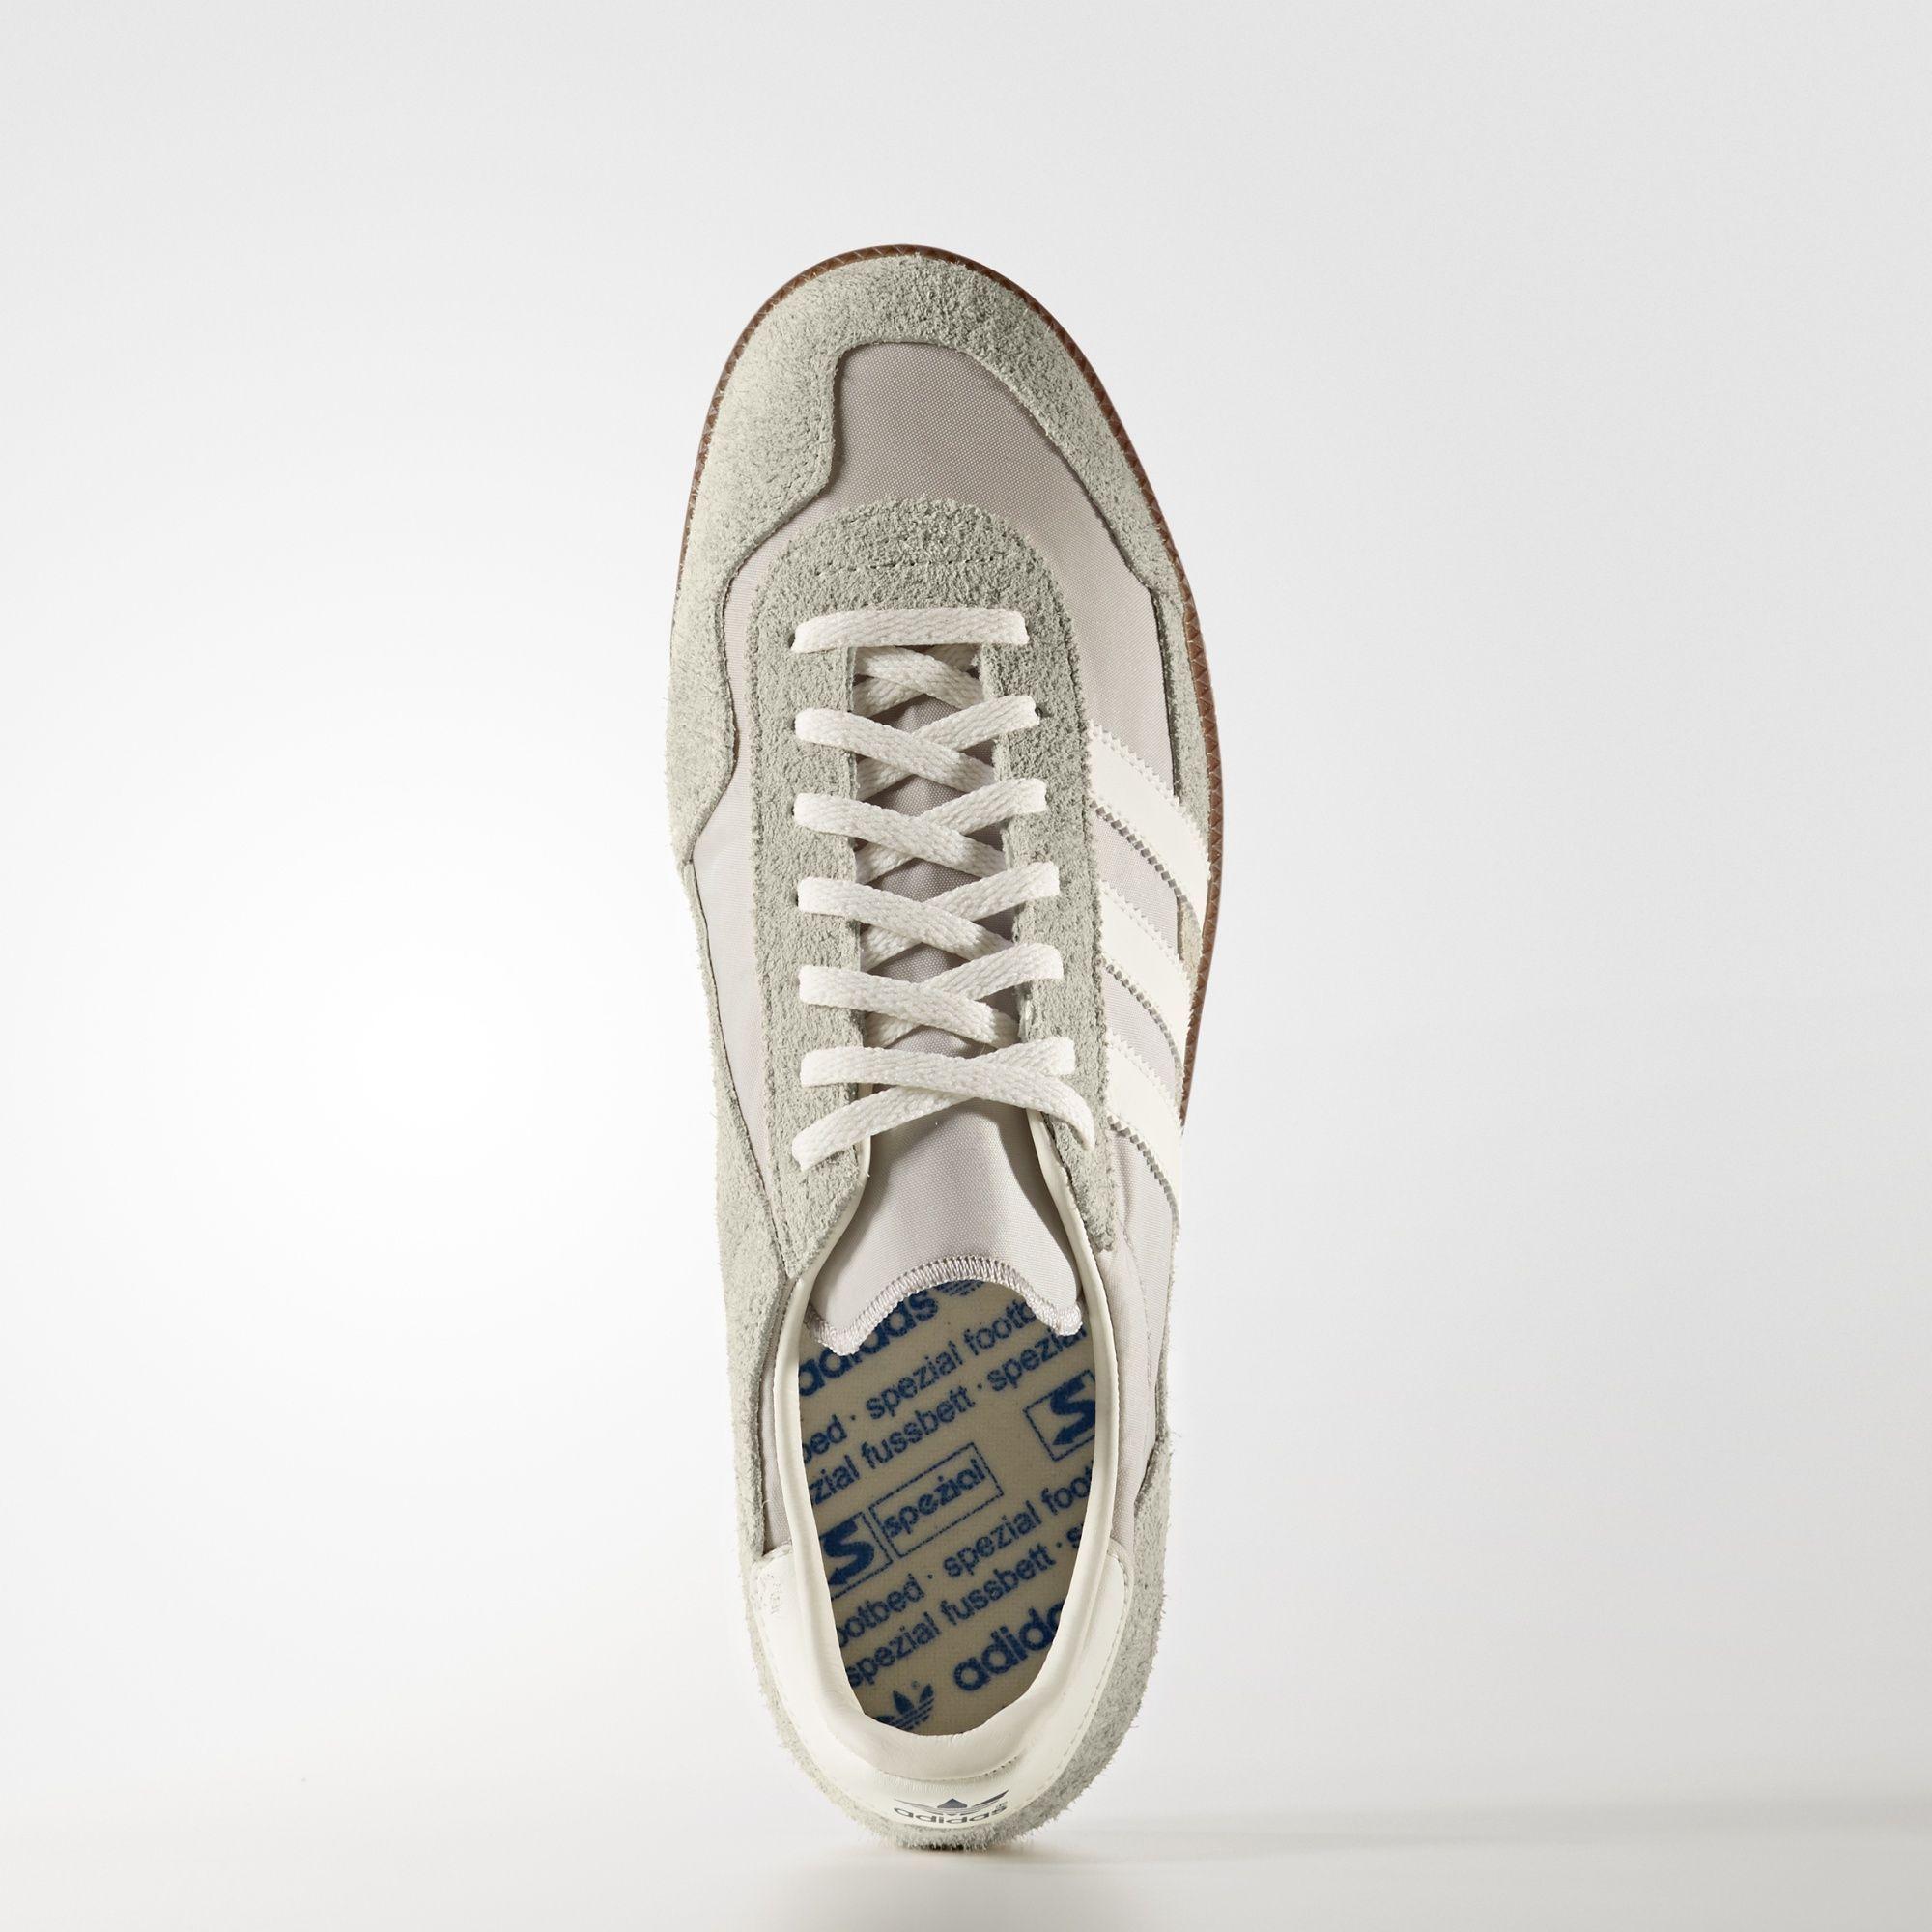 Adidas Wensley spzl Pinterest Adidas zapatos zapatos, Calzado